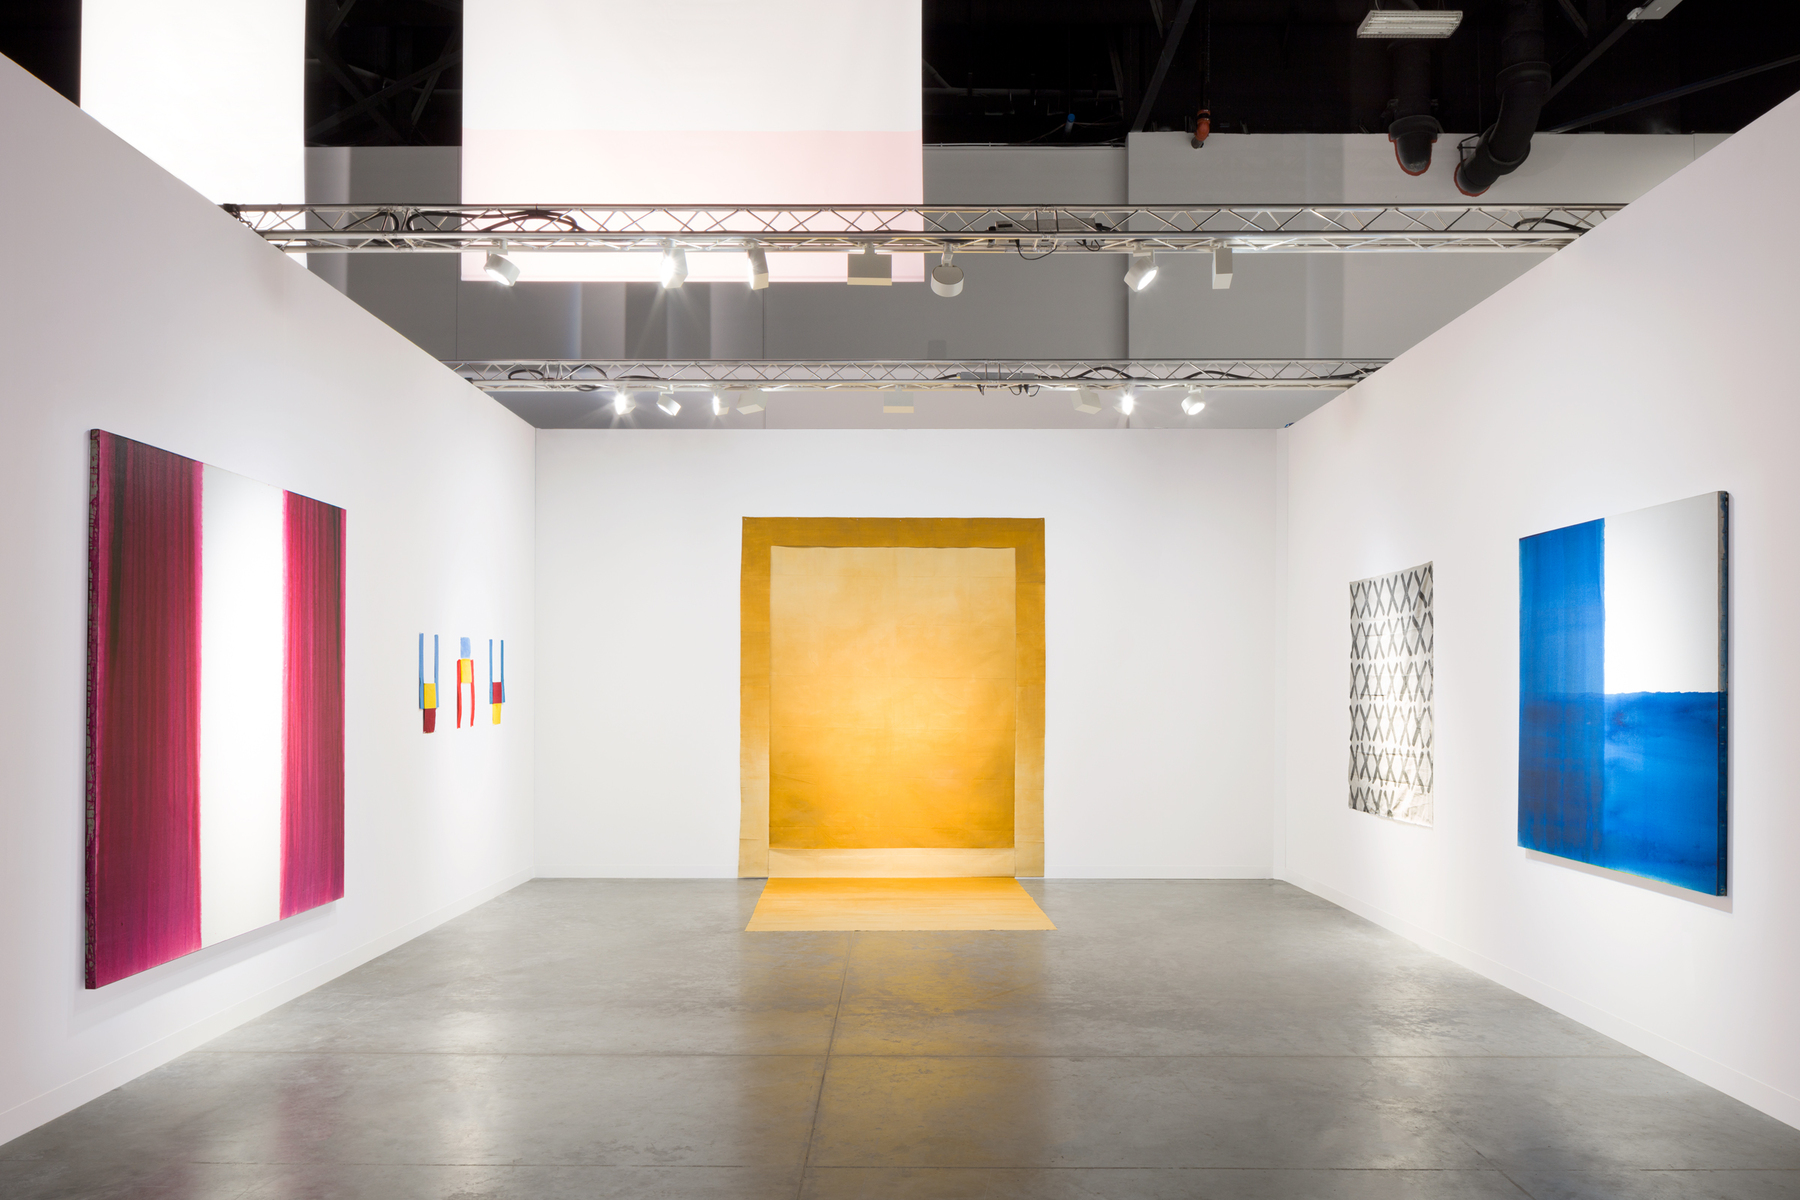 4_Art Basel Miami Beac 2018 70